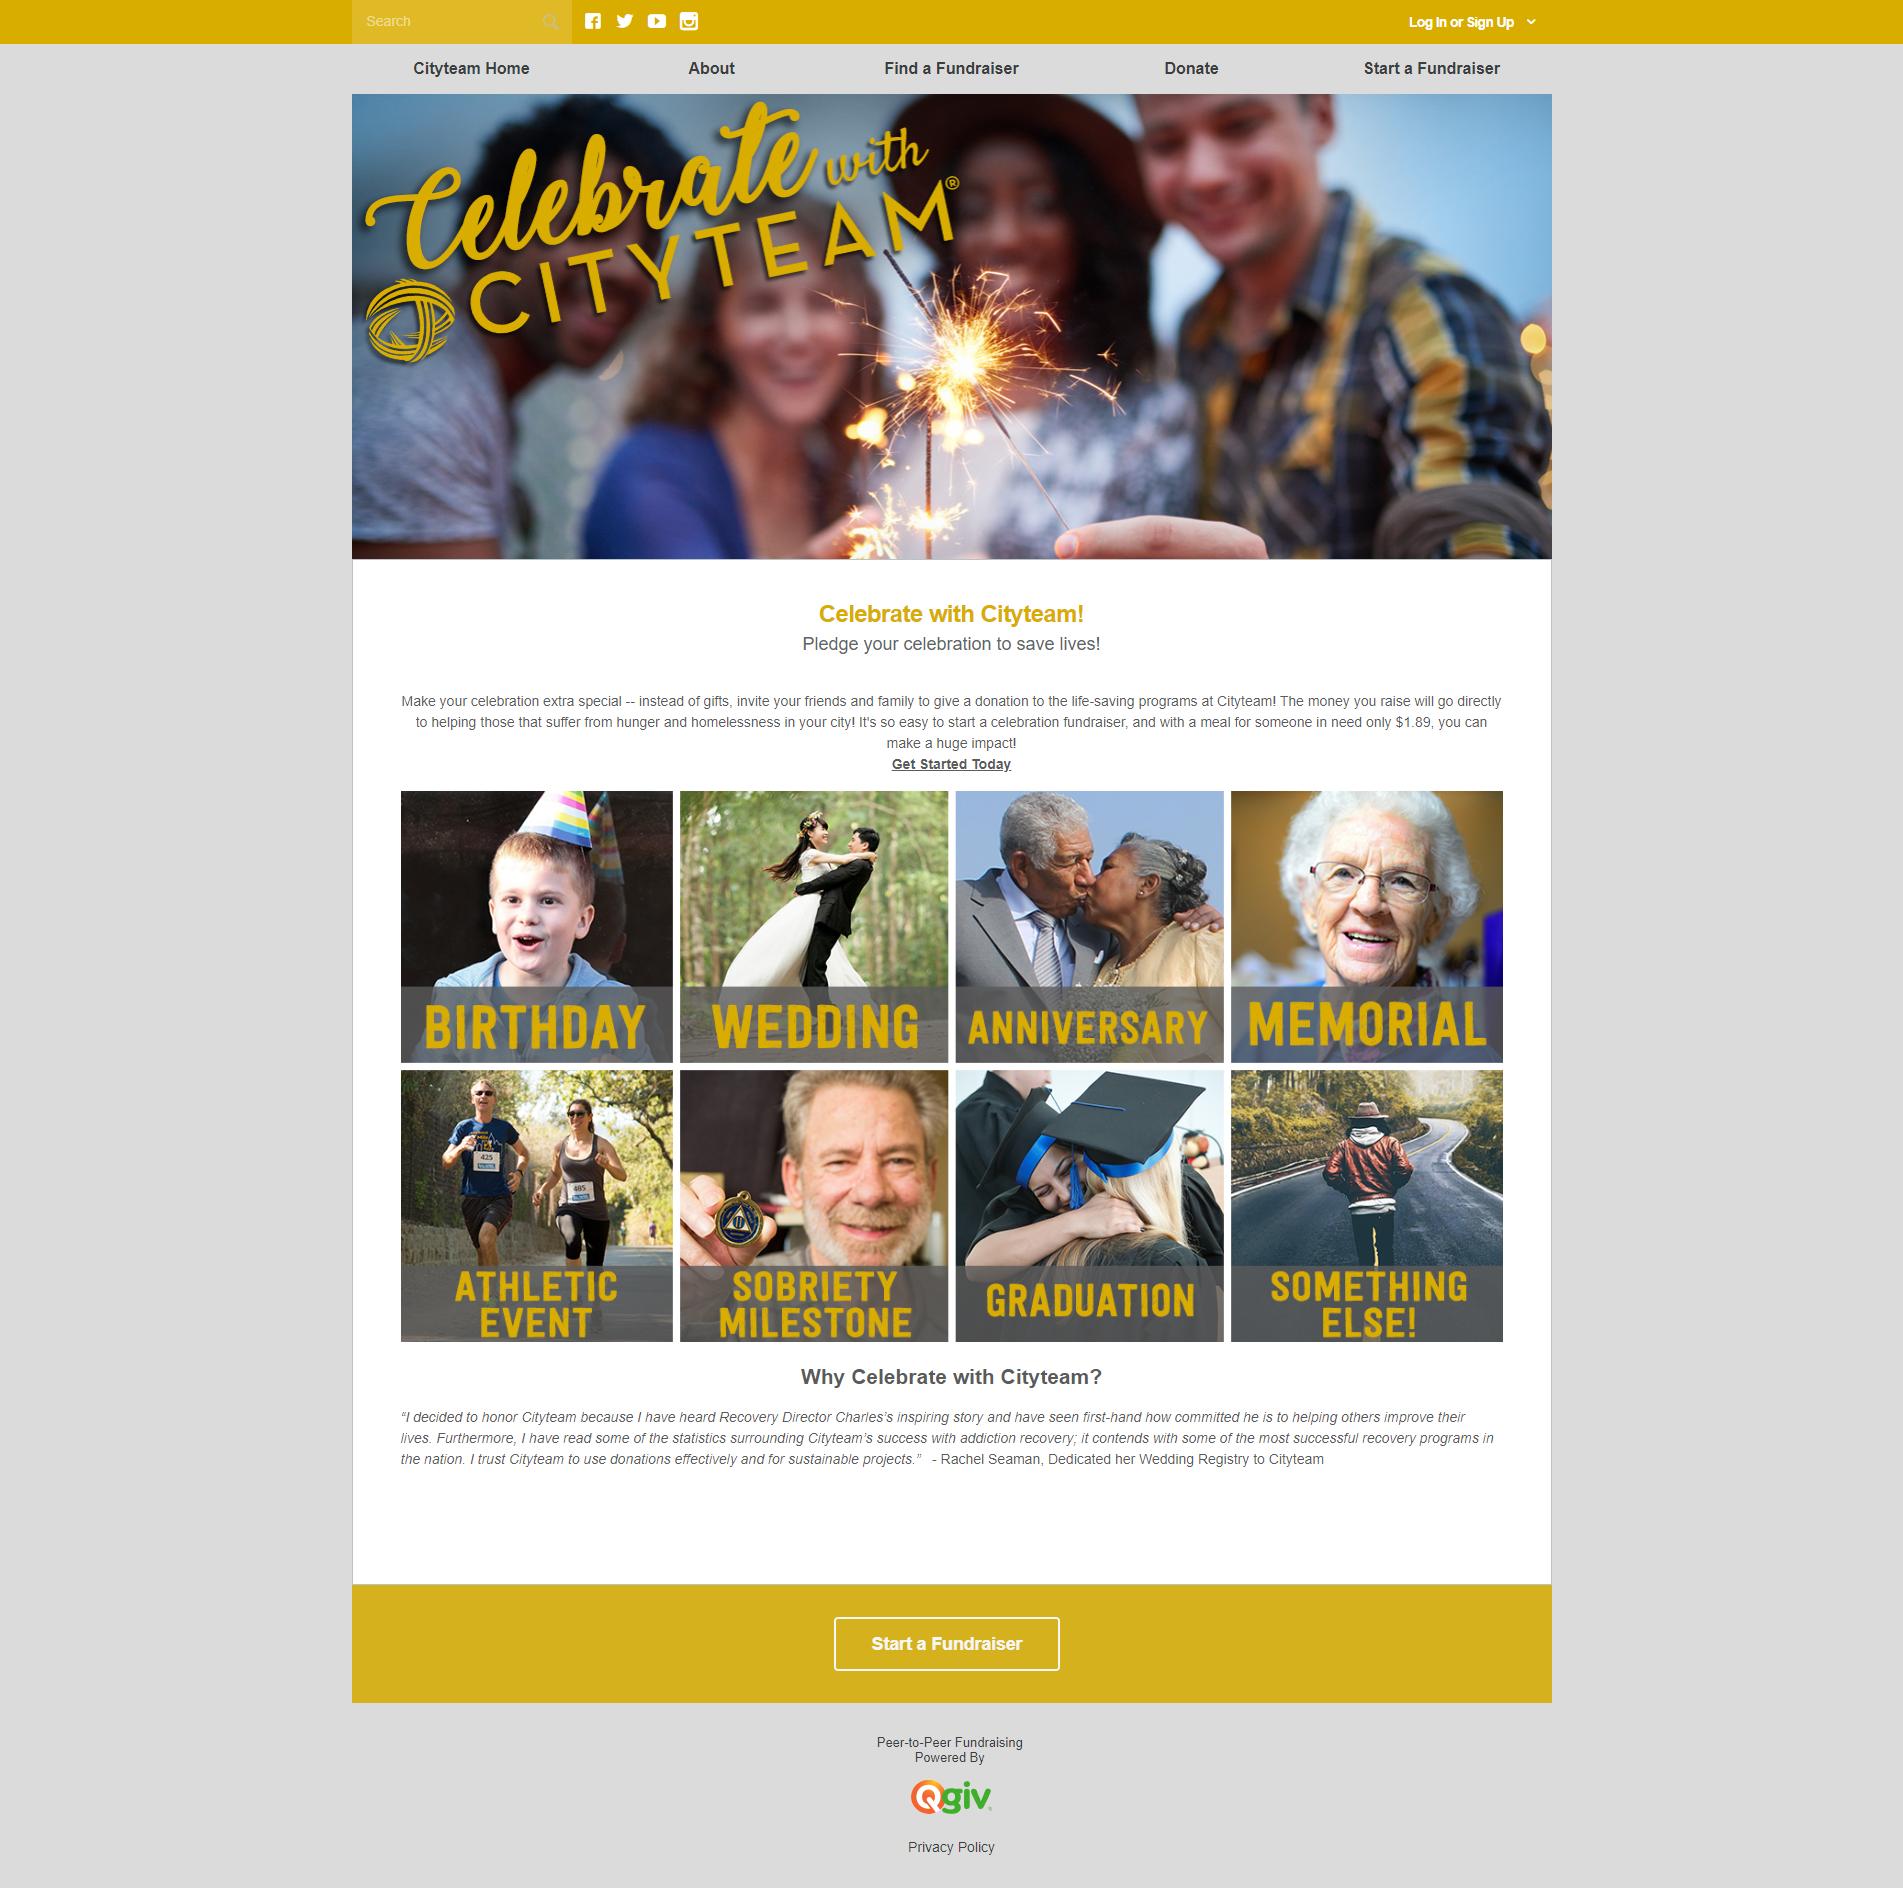 QGiv Peer-to-Peer Fundraising Page Creation Screenshot